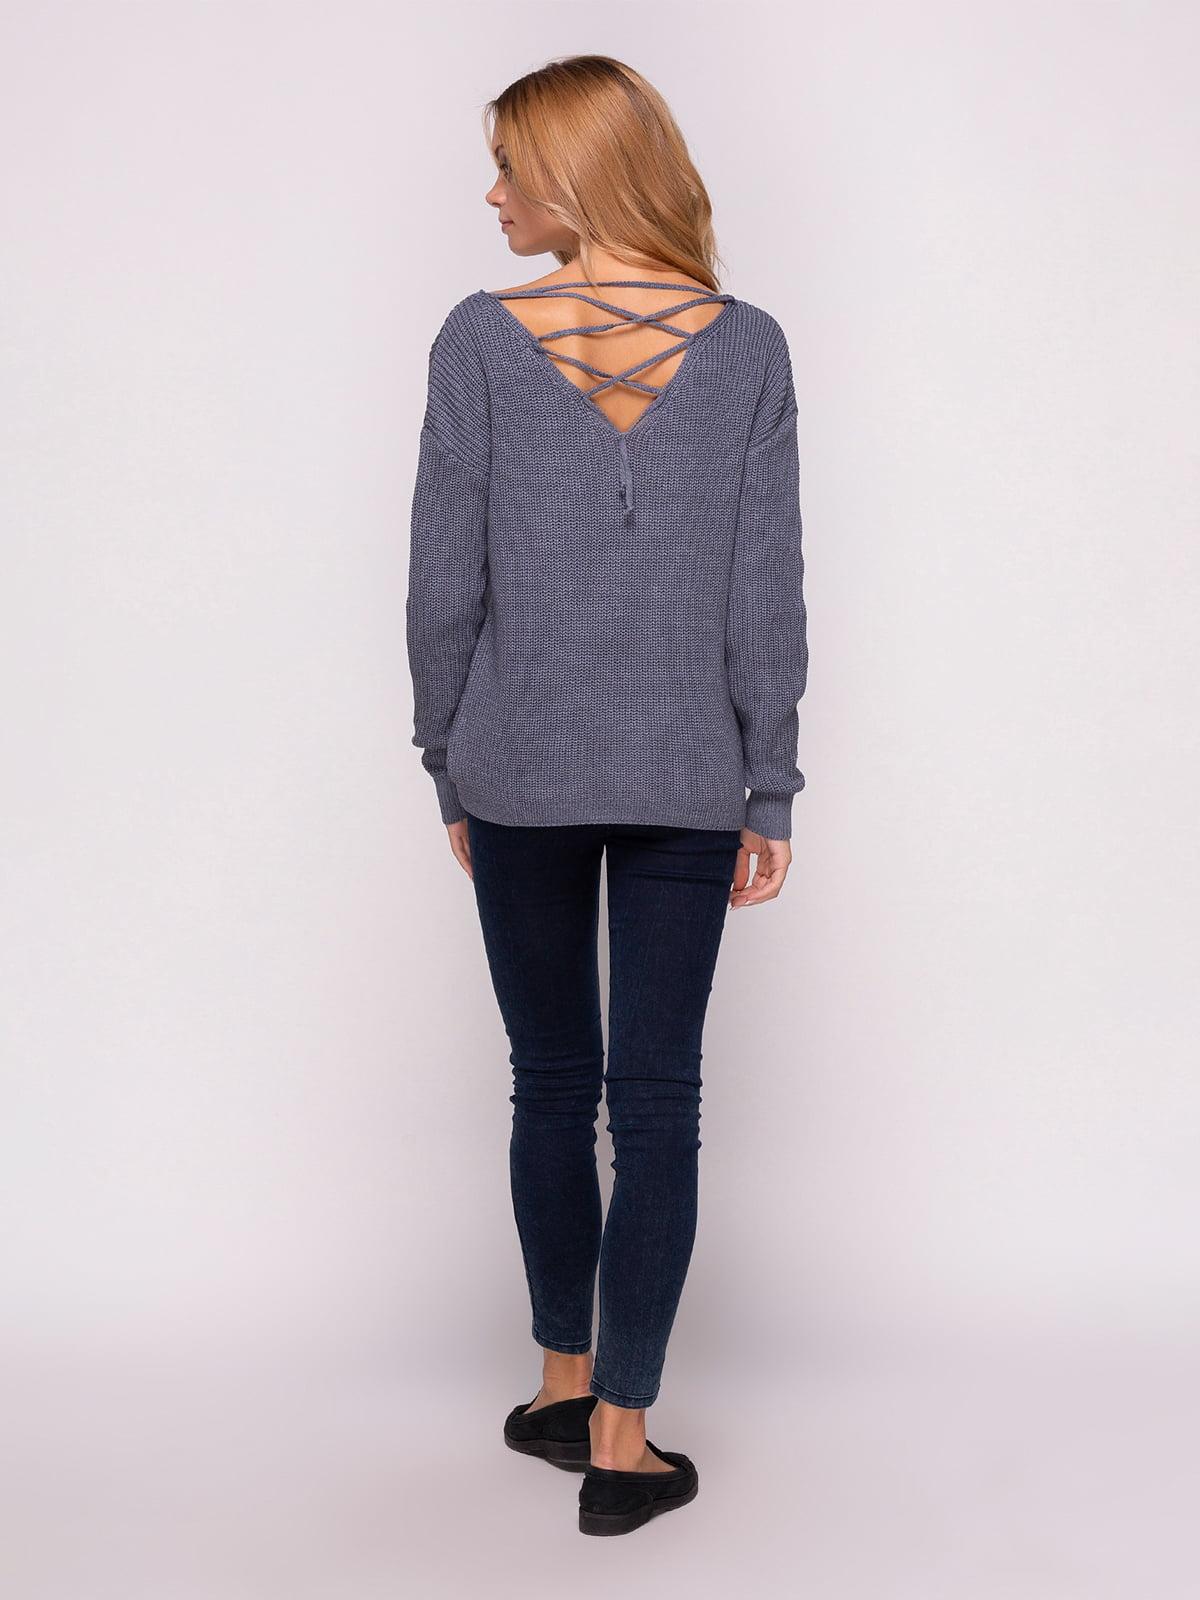 Пуловер димного кольору | 4567061 | фото 3